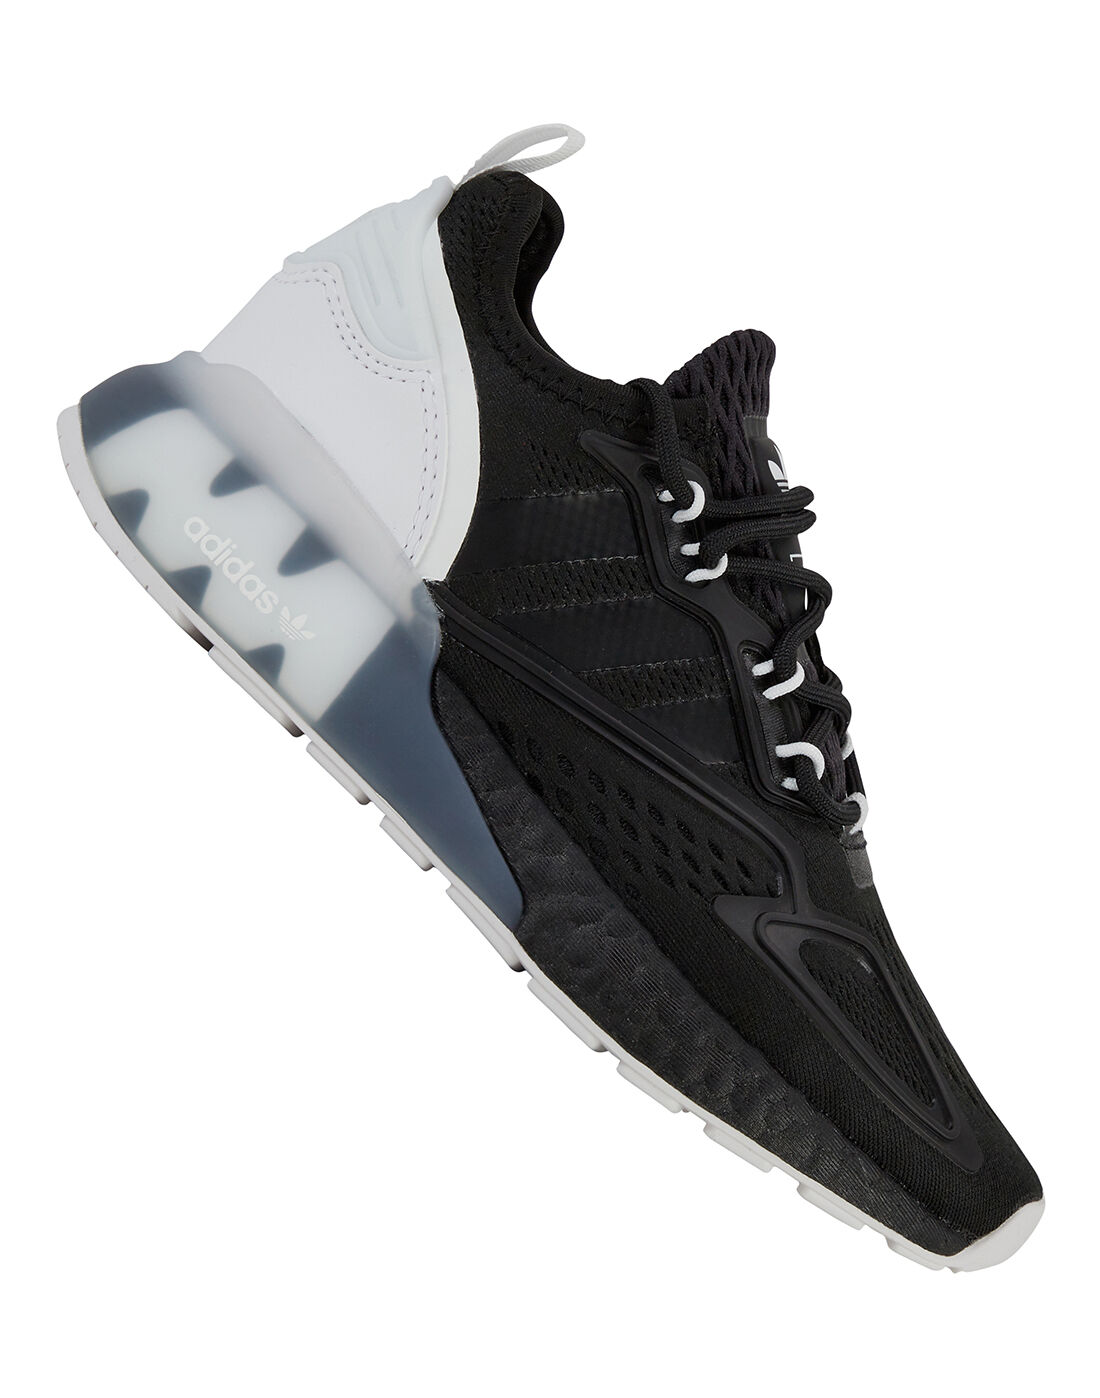 adidas Originals adidas vespa high tops black jeans plus size | Older Kids ZX 2K BOOST